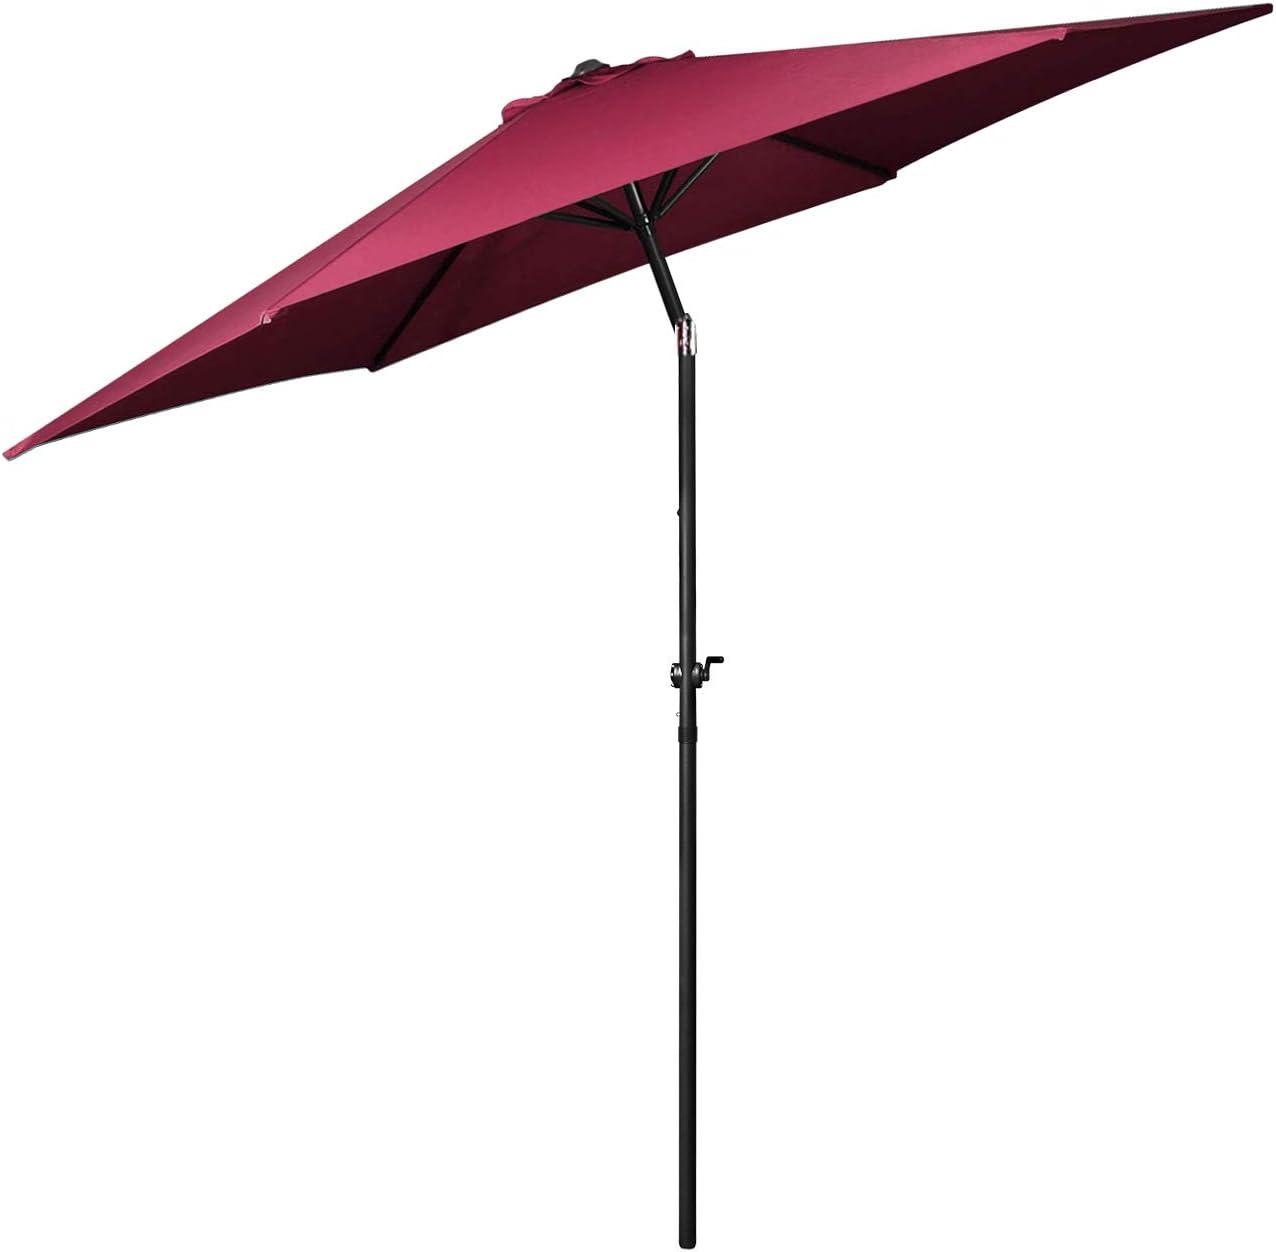 Flexzion Patio Umbrella 9 Feet - Portable Aluminum Outdoor Table Desk Umbrella Furniture with Hexagon Shape Polyester Cover 6 Steel Ribs Wind Vent for Market Beach Garden Backyard Pool Sunshine (Red)